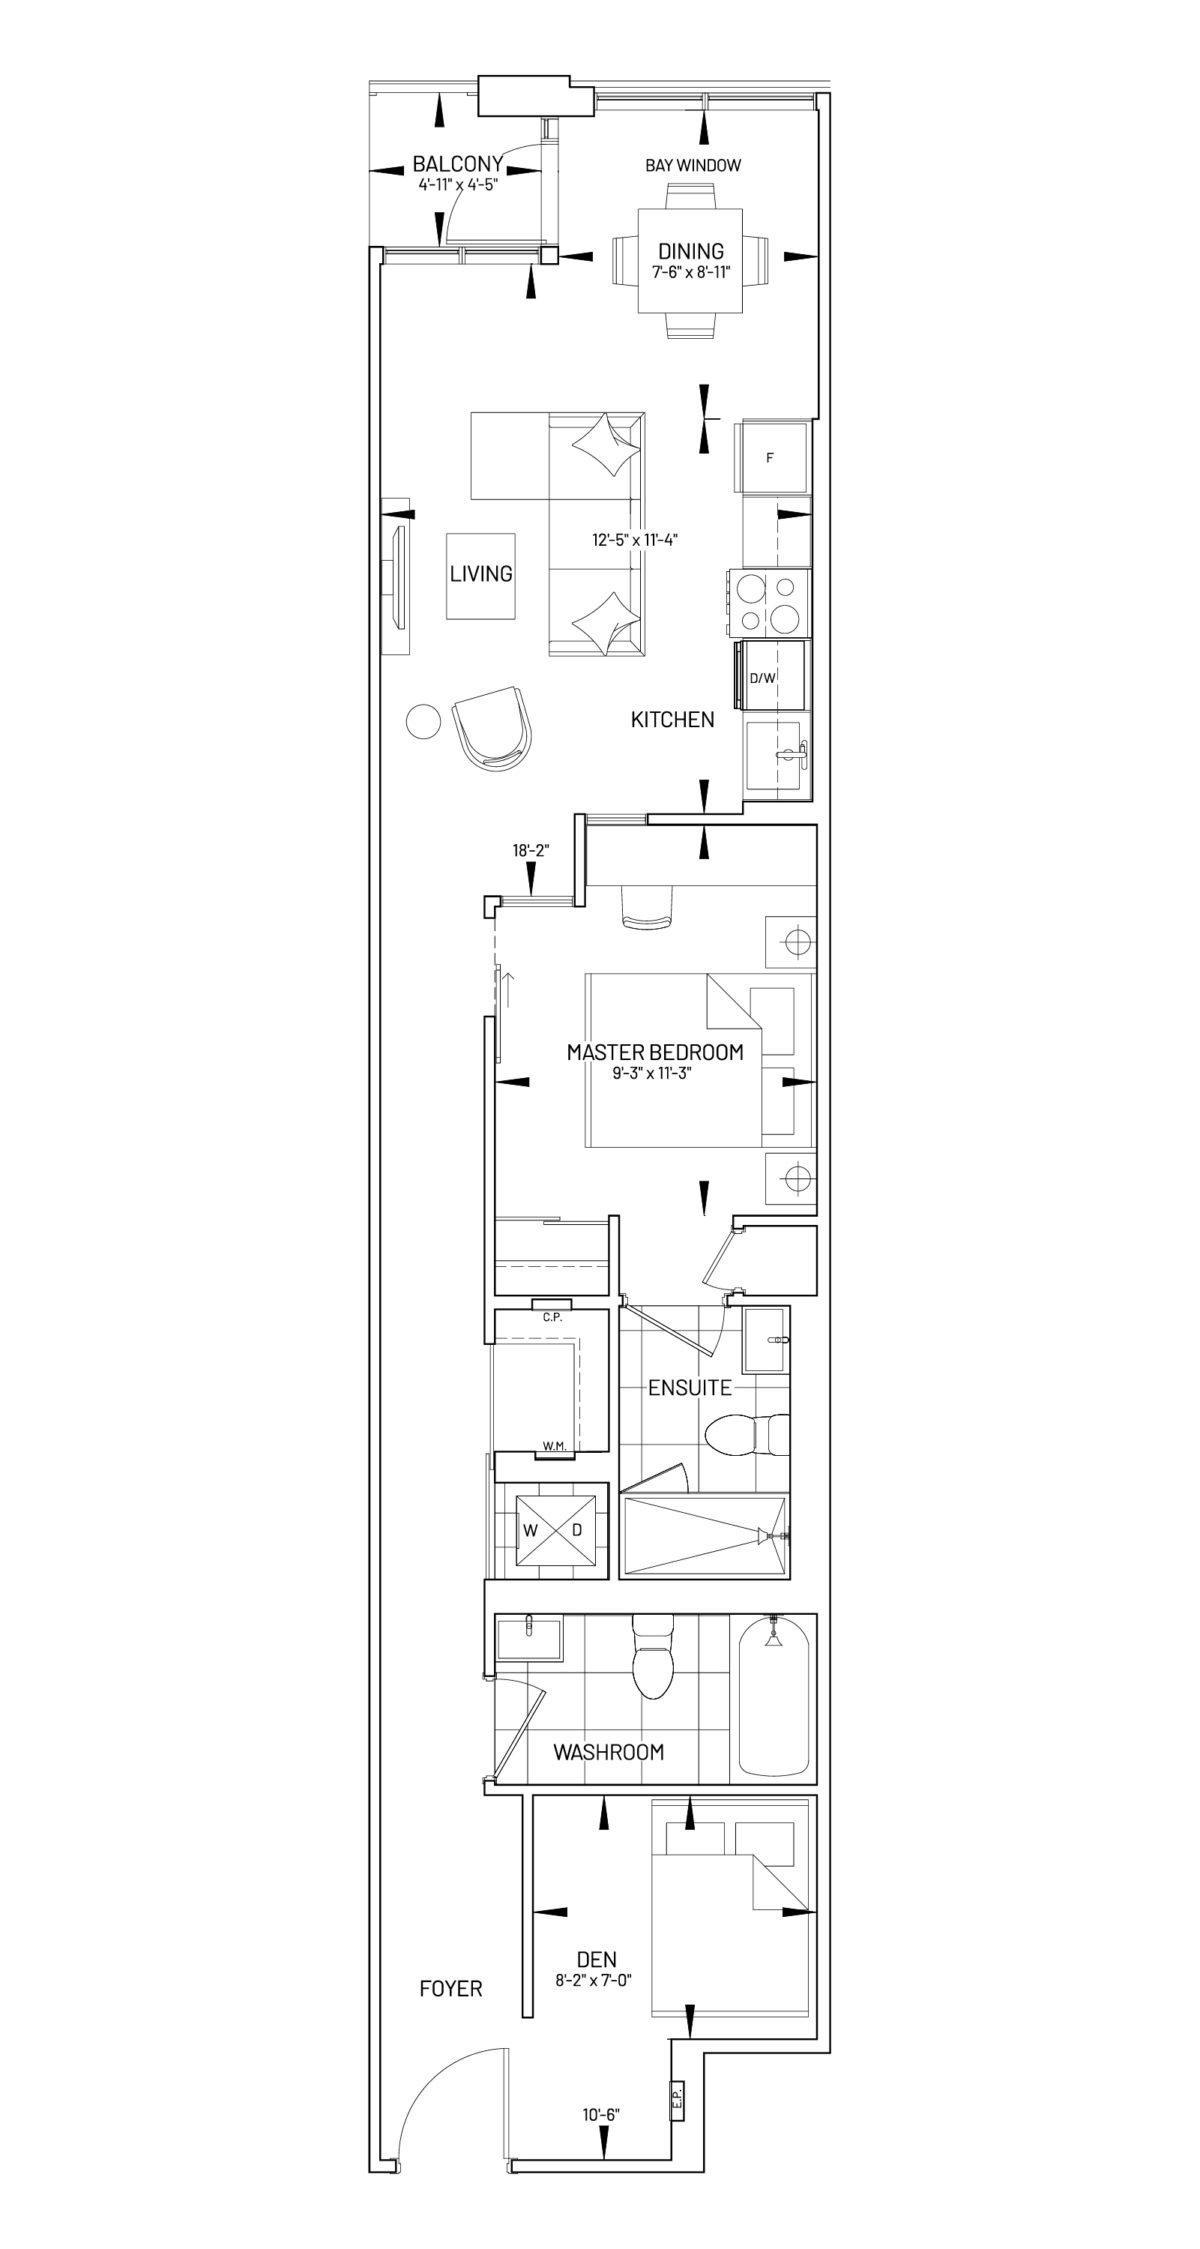 Suite 1D-L Floor Plan